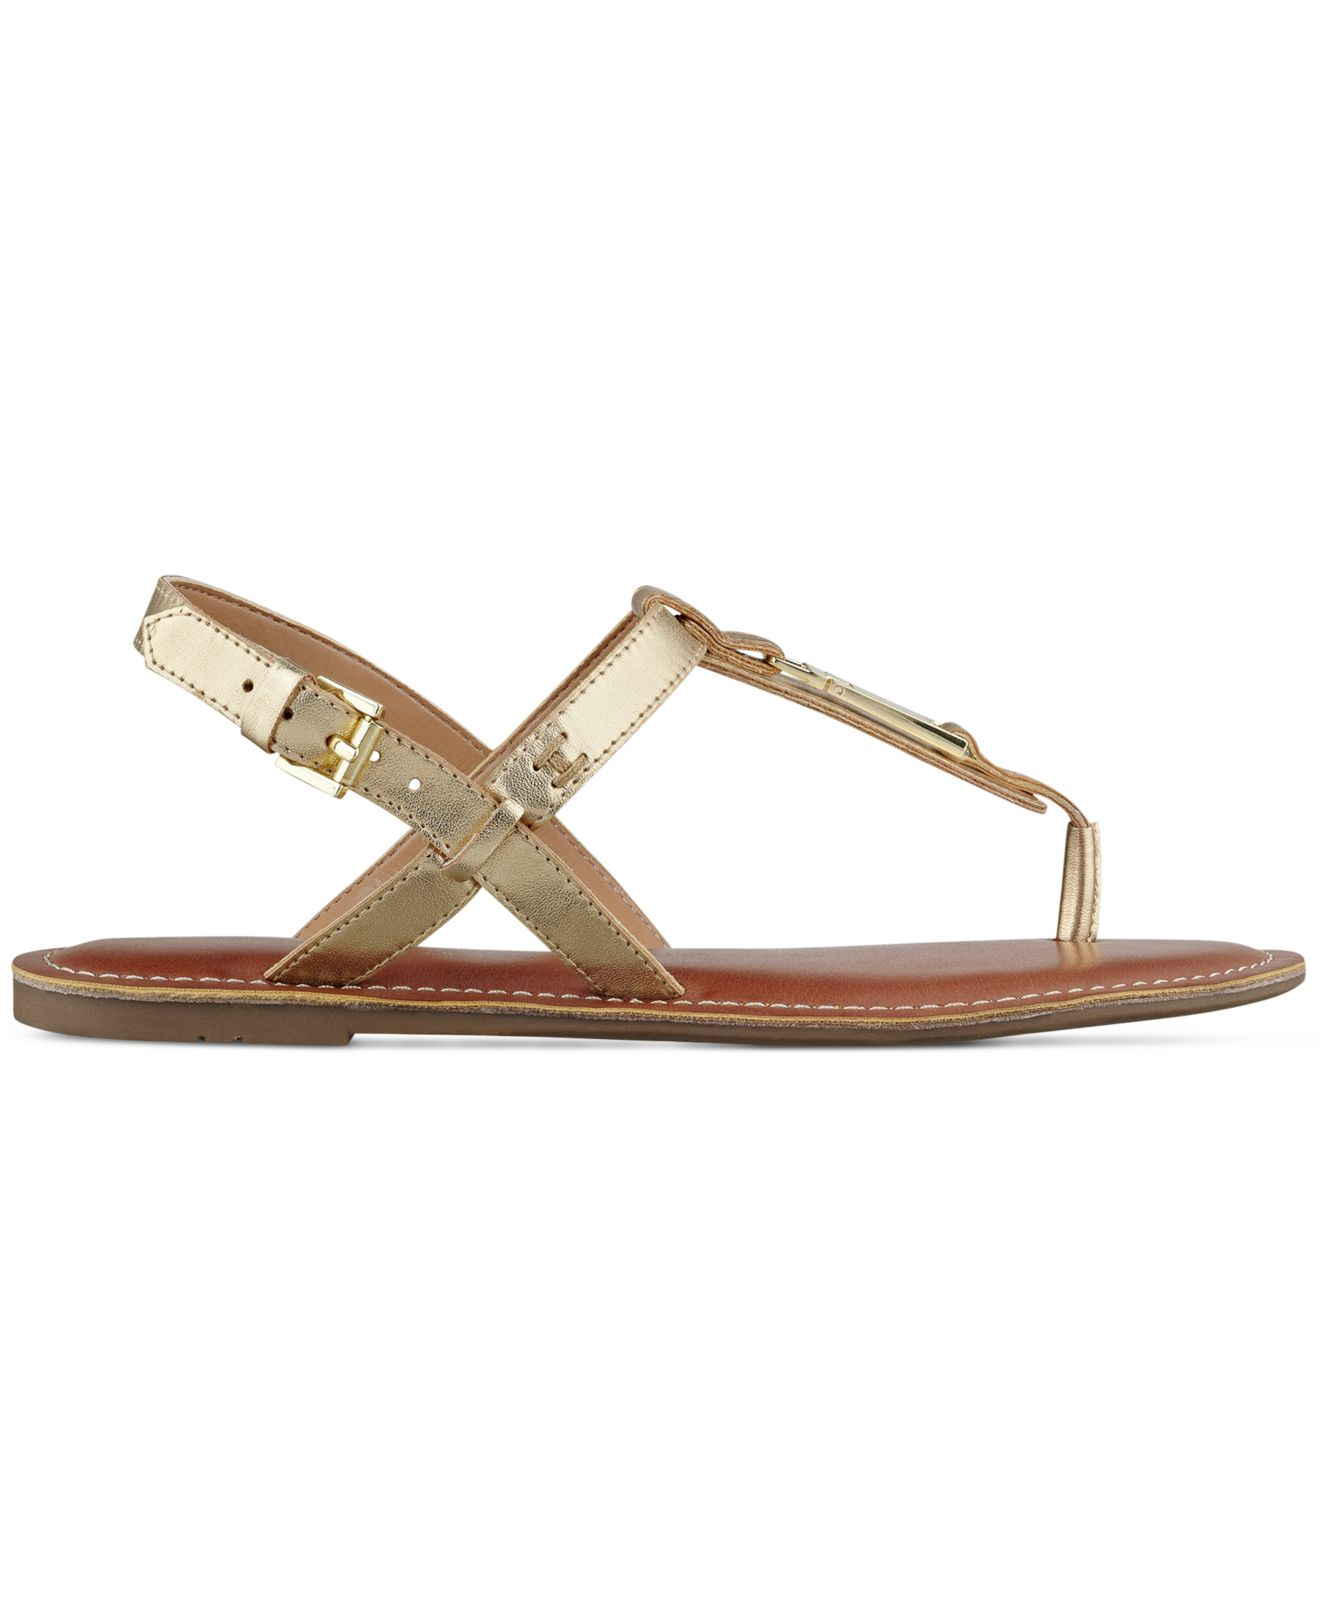 9c3657b5b Lyst - Tommy Hilfiger Lansey Flat Thong Sandals in Metallic